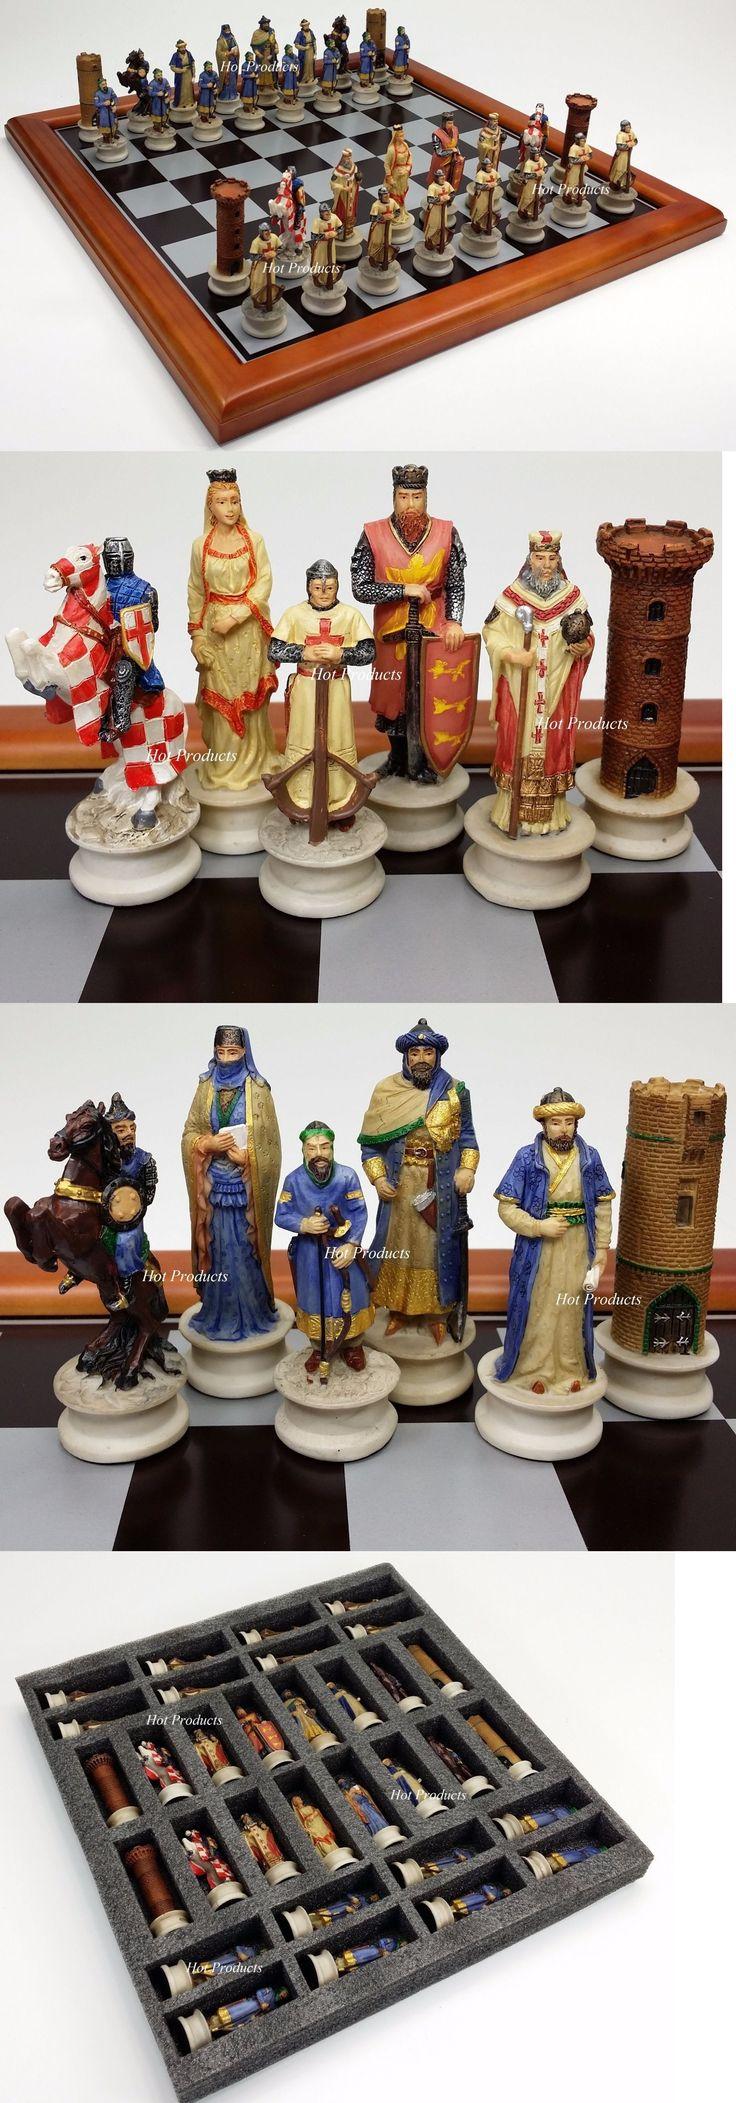 8 Mejores Im Genes De Chess Sets En Pinterest Juegos De Ajedrez  # Muebles De Cocina Jaque Mate